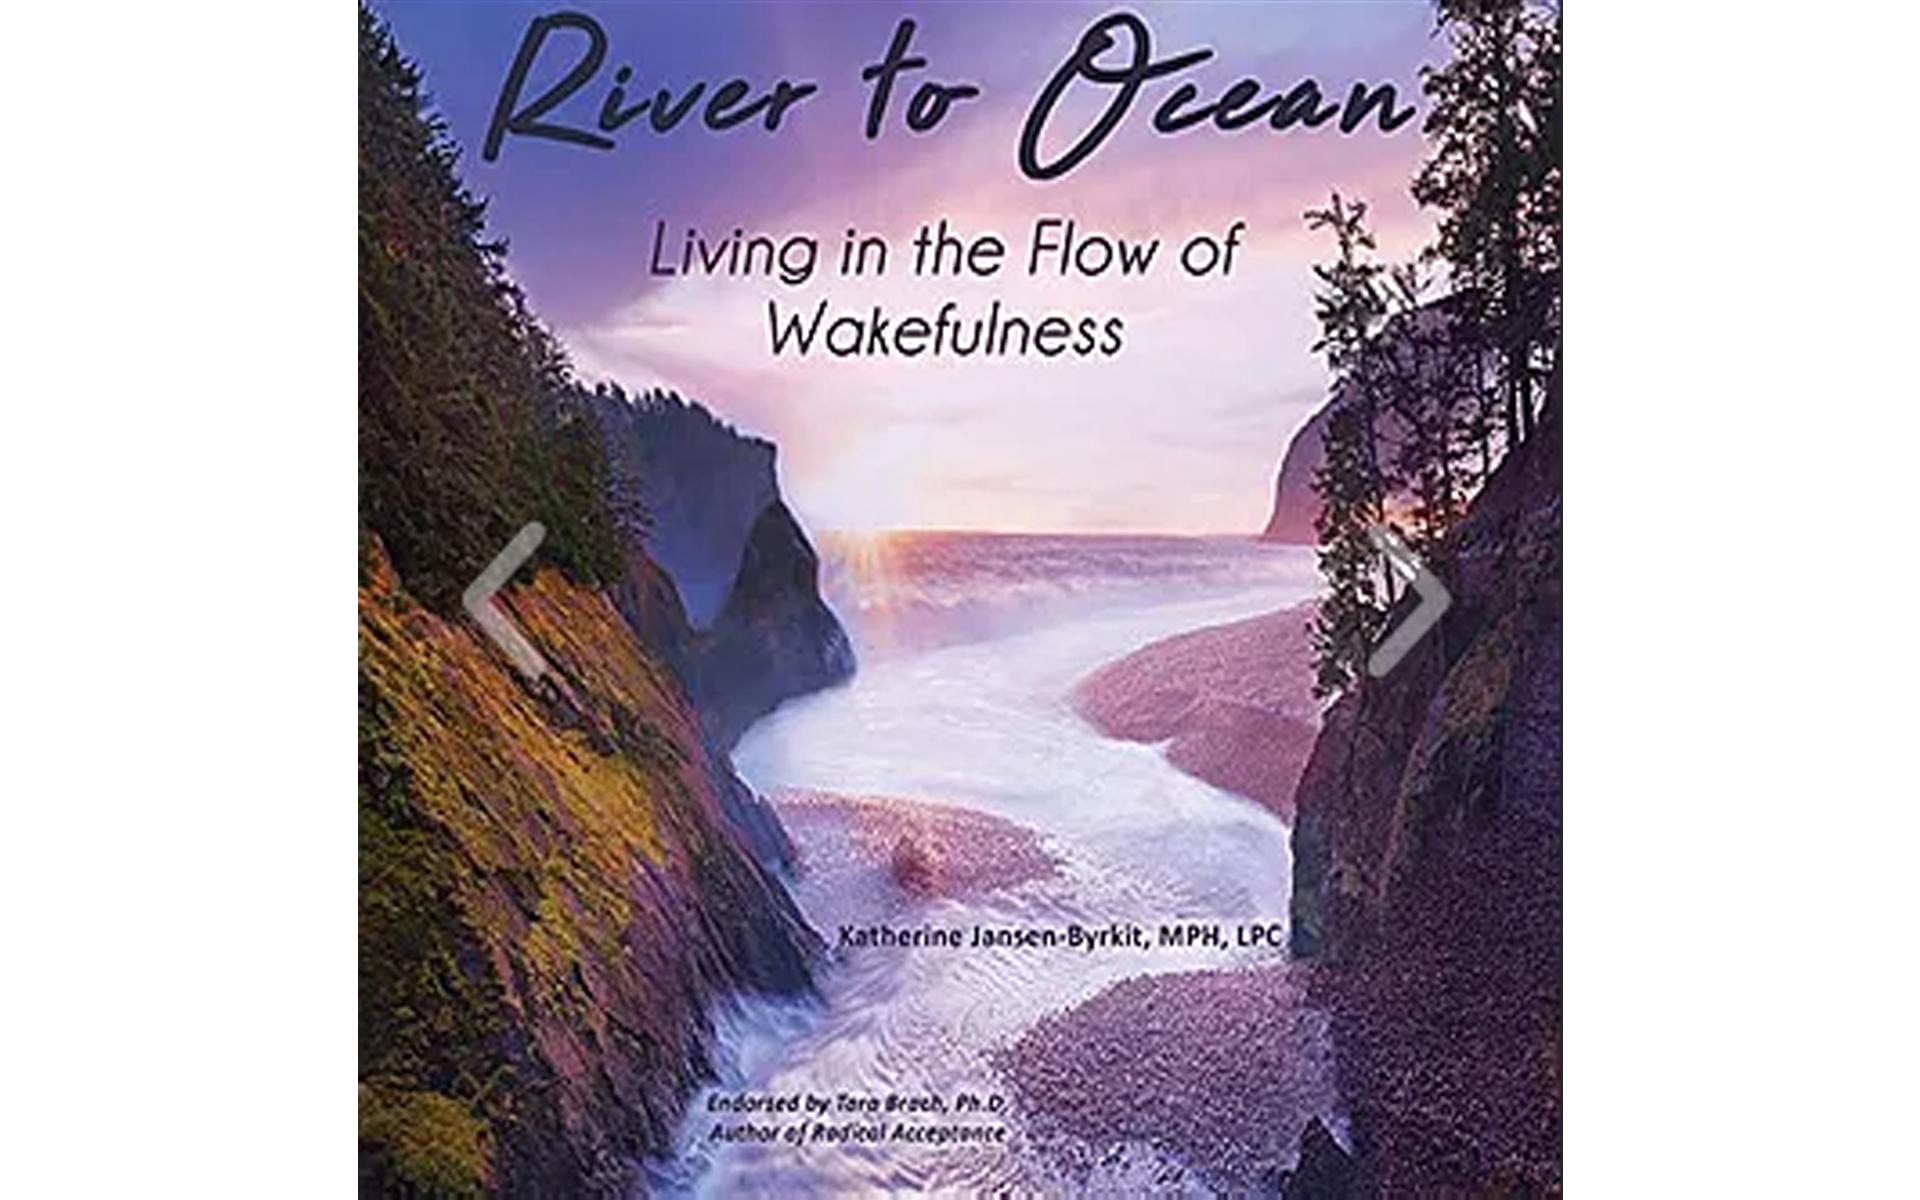 River to Ocean